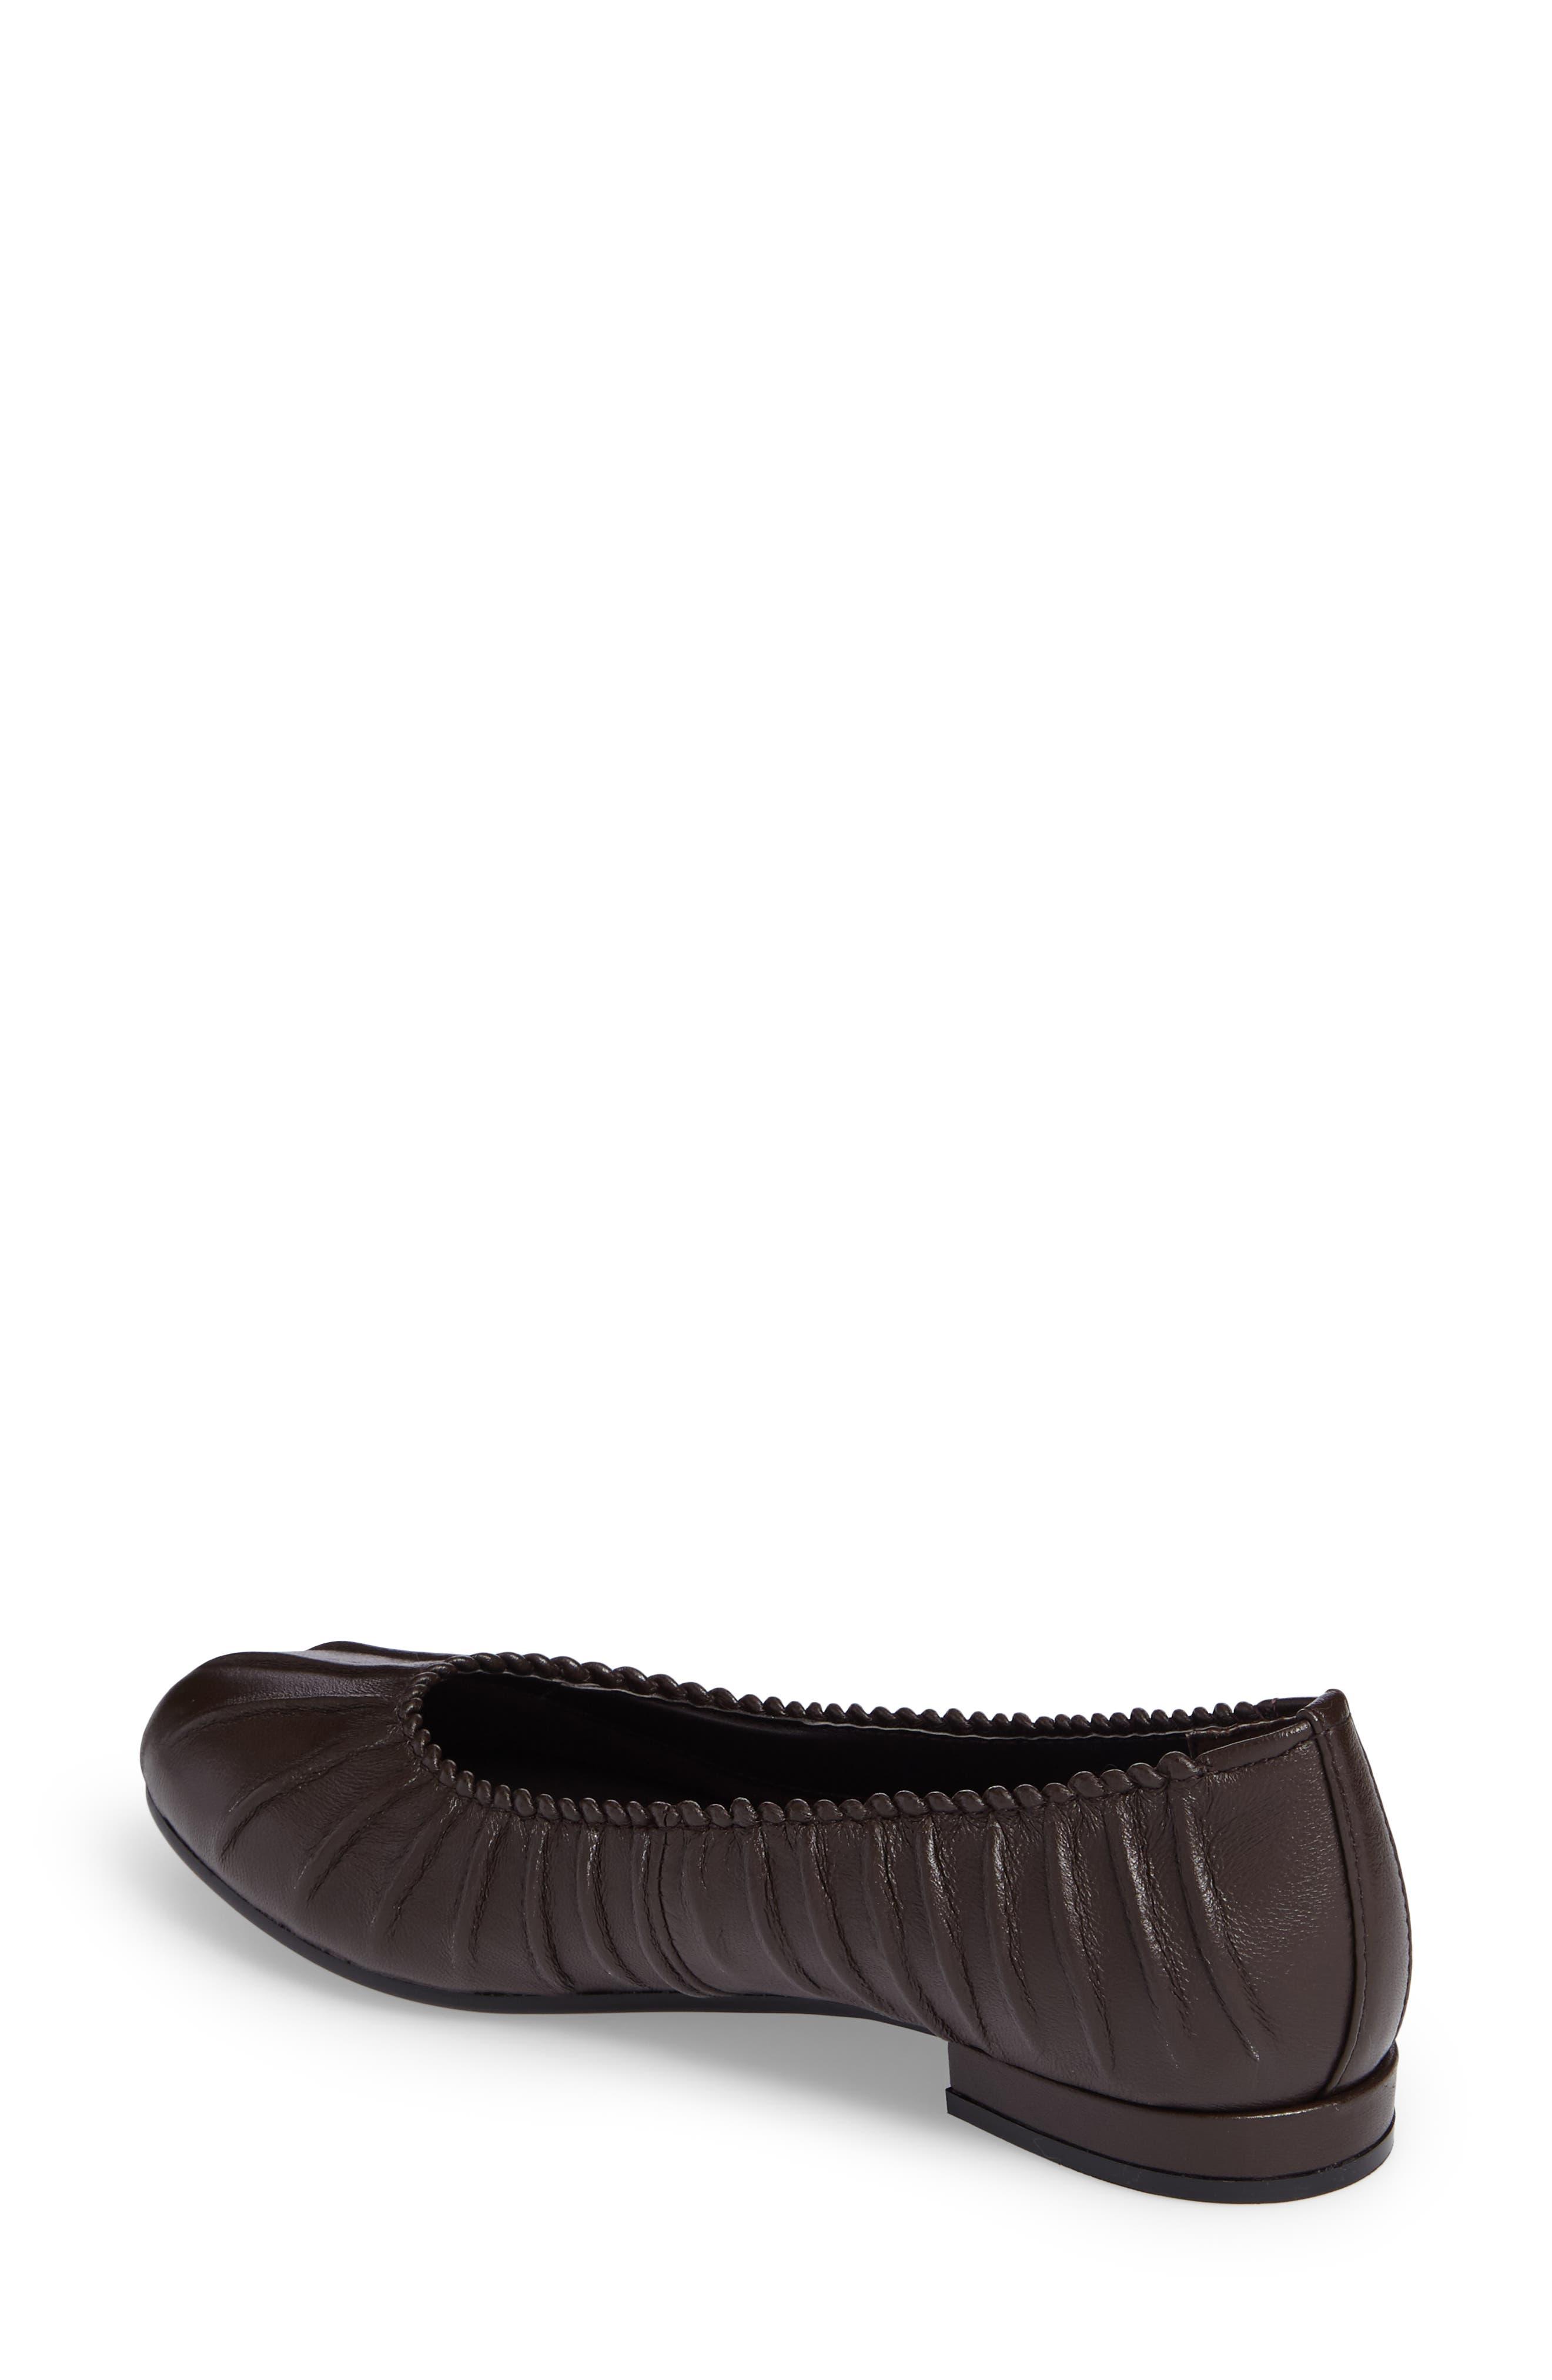 Santo Flat,                             Alternate thumbnail 2, color,                             Brown Leather